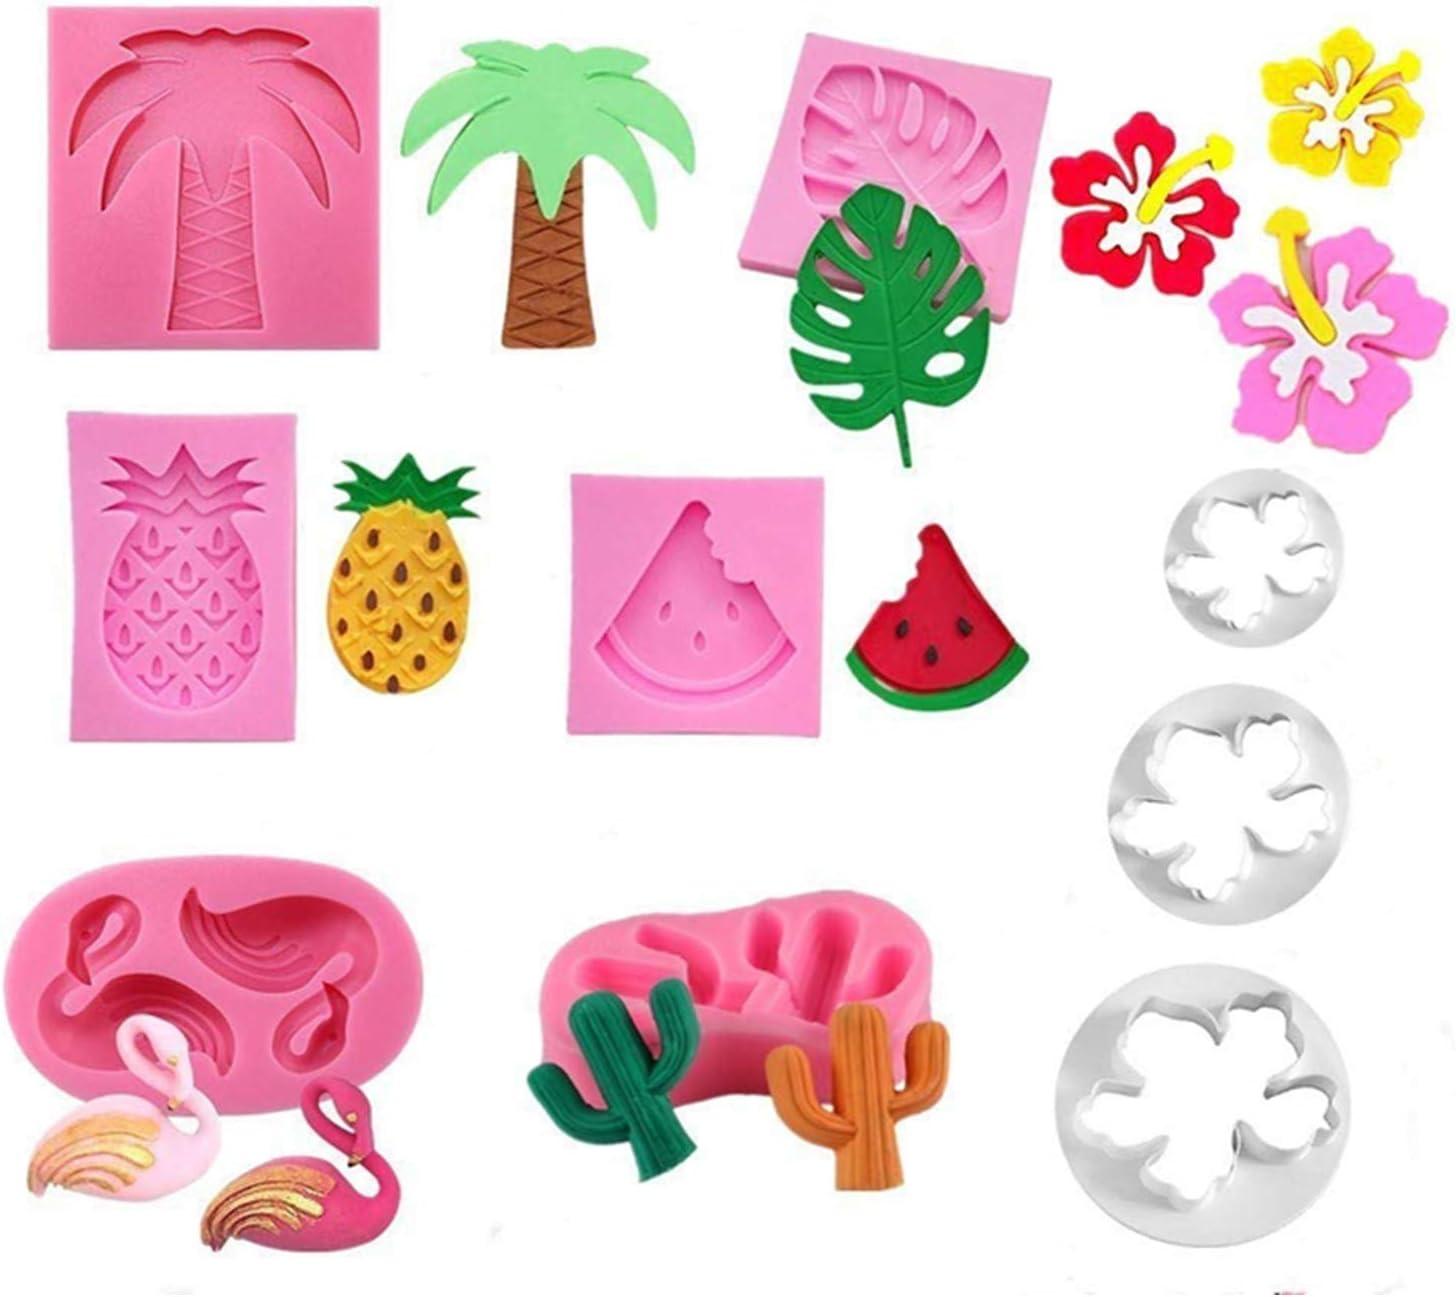 Jasonsy Hawaiian Tropical Rain Forest Theme Cake Fondant Mold Set,Flamingo/Pineapple/Cactus/Watermelon/Tropical Leaf/Coconut Palm Tree/Coconut Tree Flower Candy Silicone Mold Cake Decoration(9 pcs)